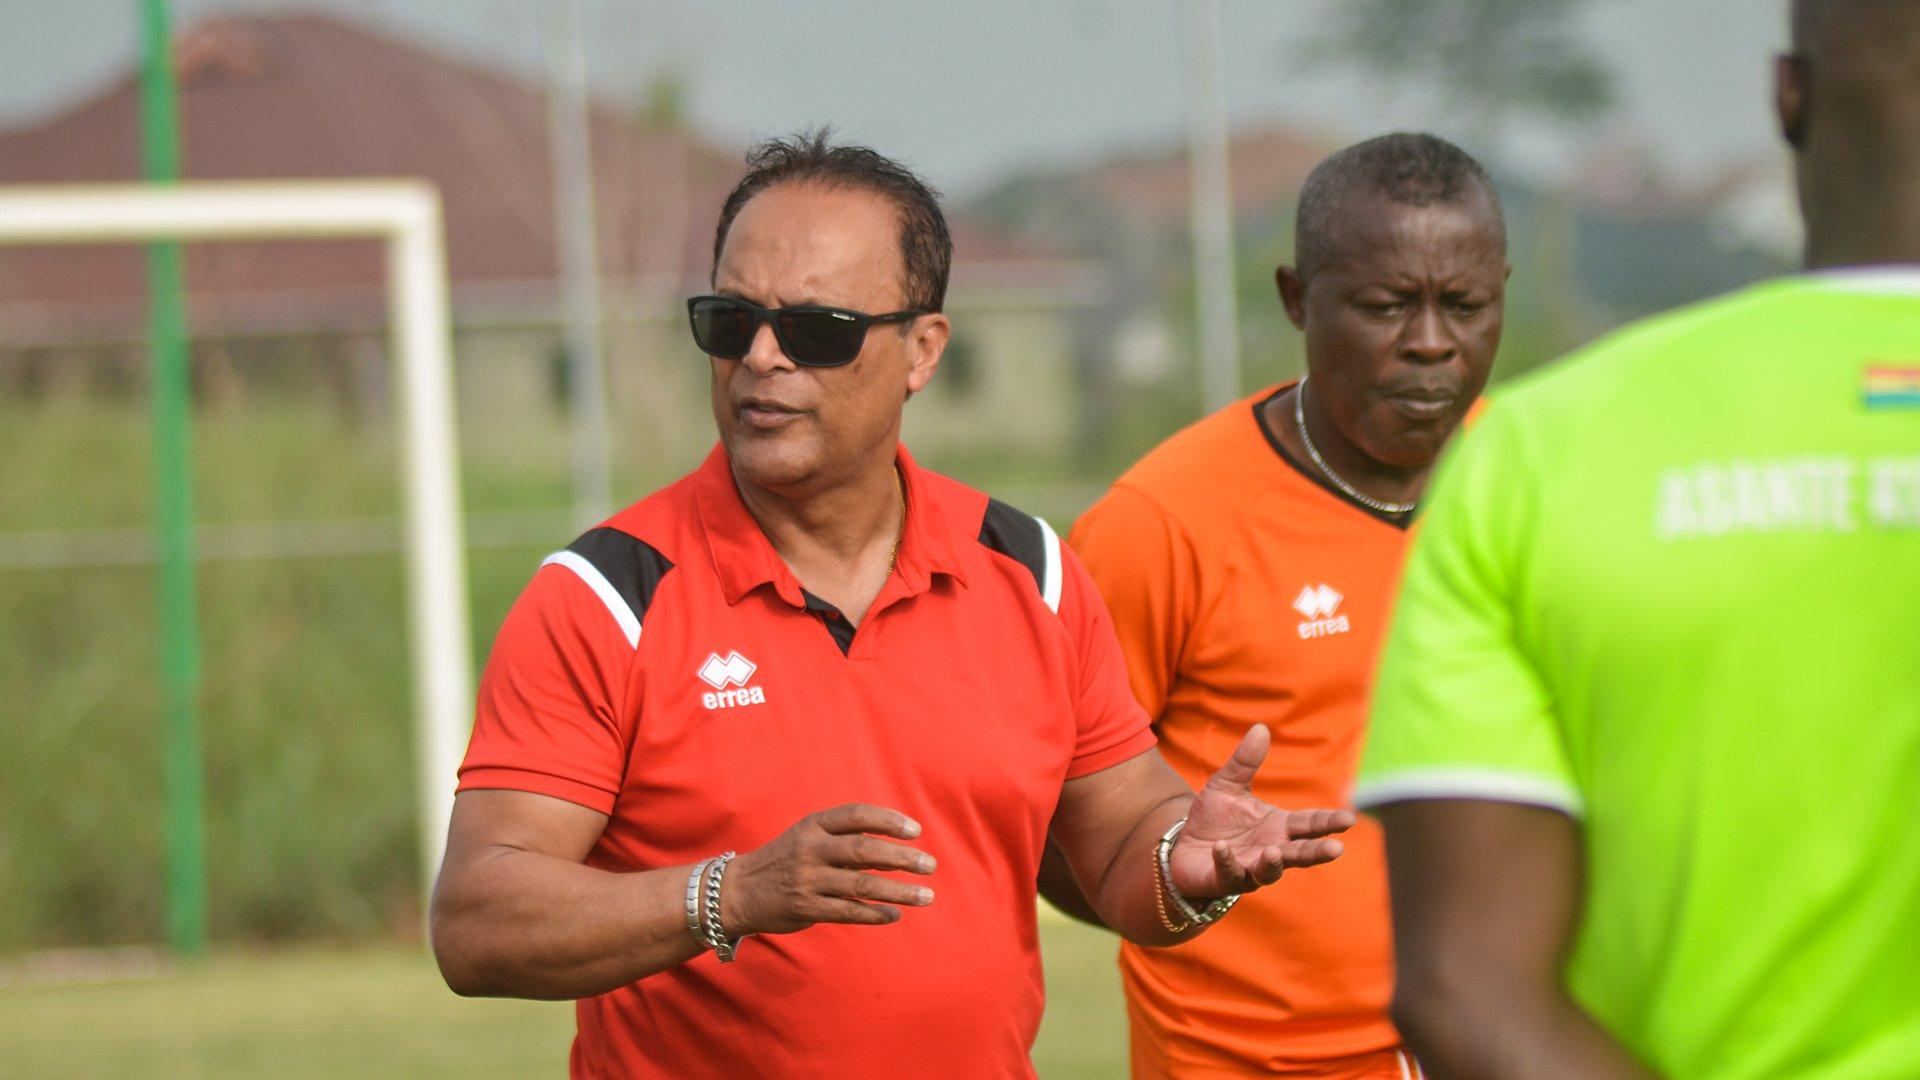 2020/21 Ghana Premier League: Asante Kotoko could have scored nine against Bechem United - Mariano Barreto